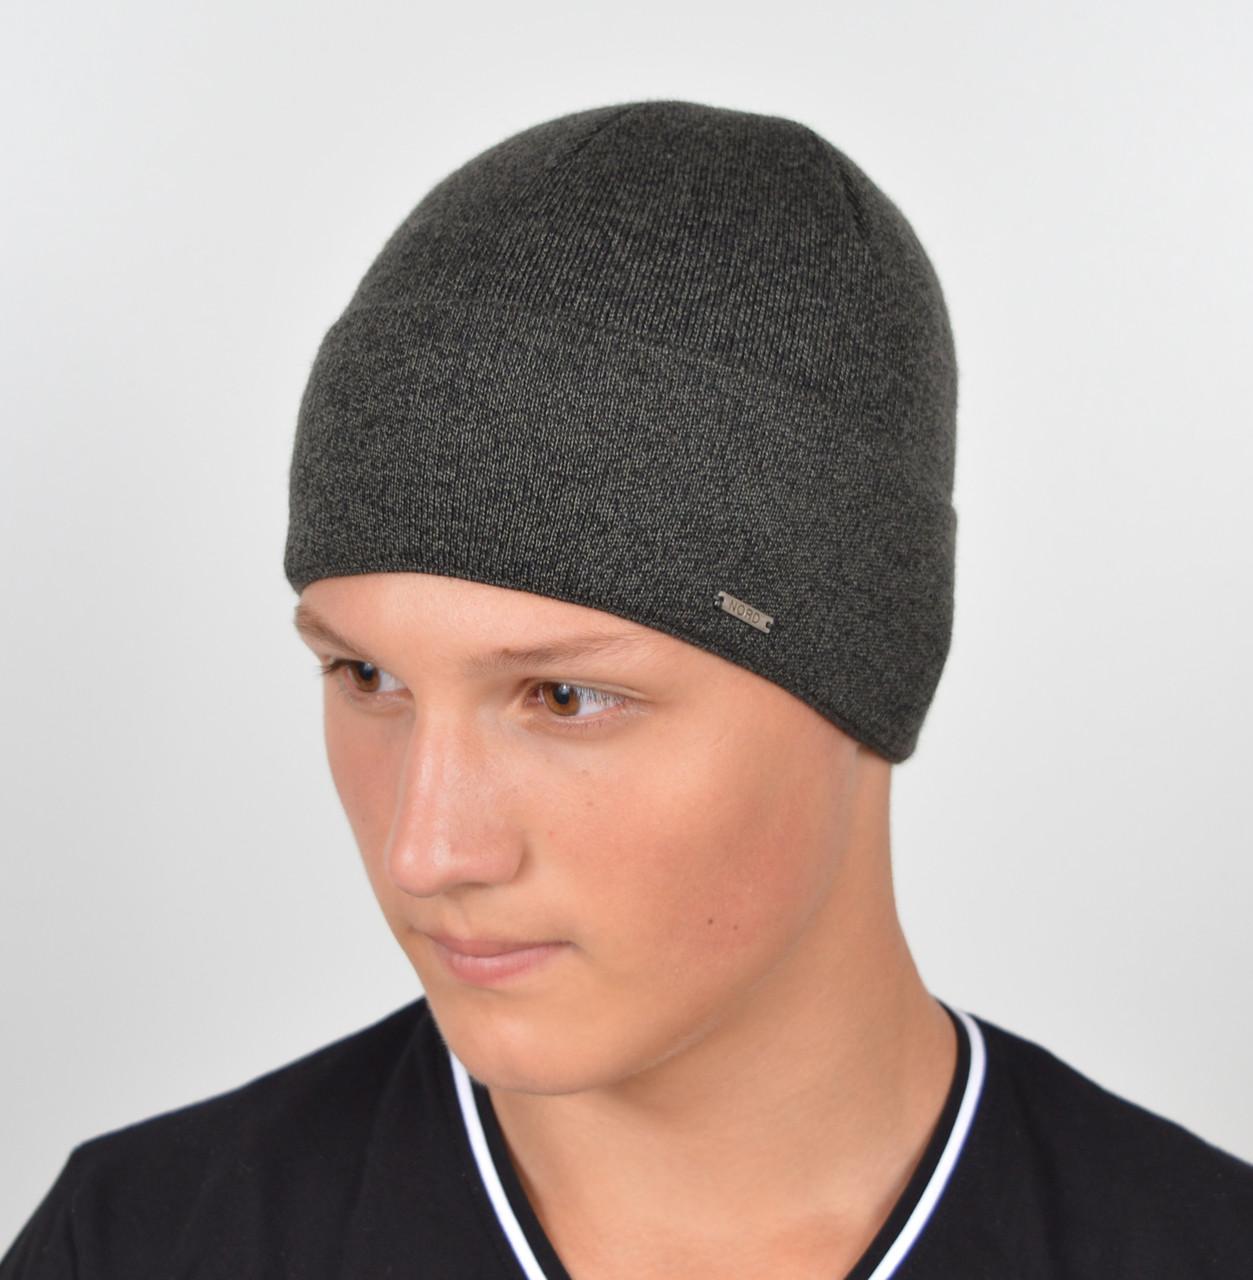 шапки хмельницкий